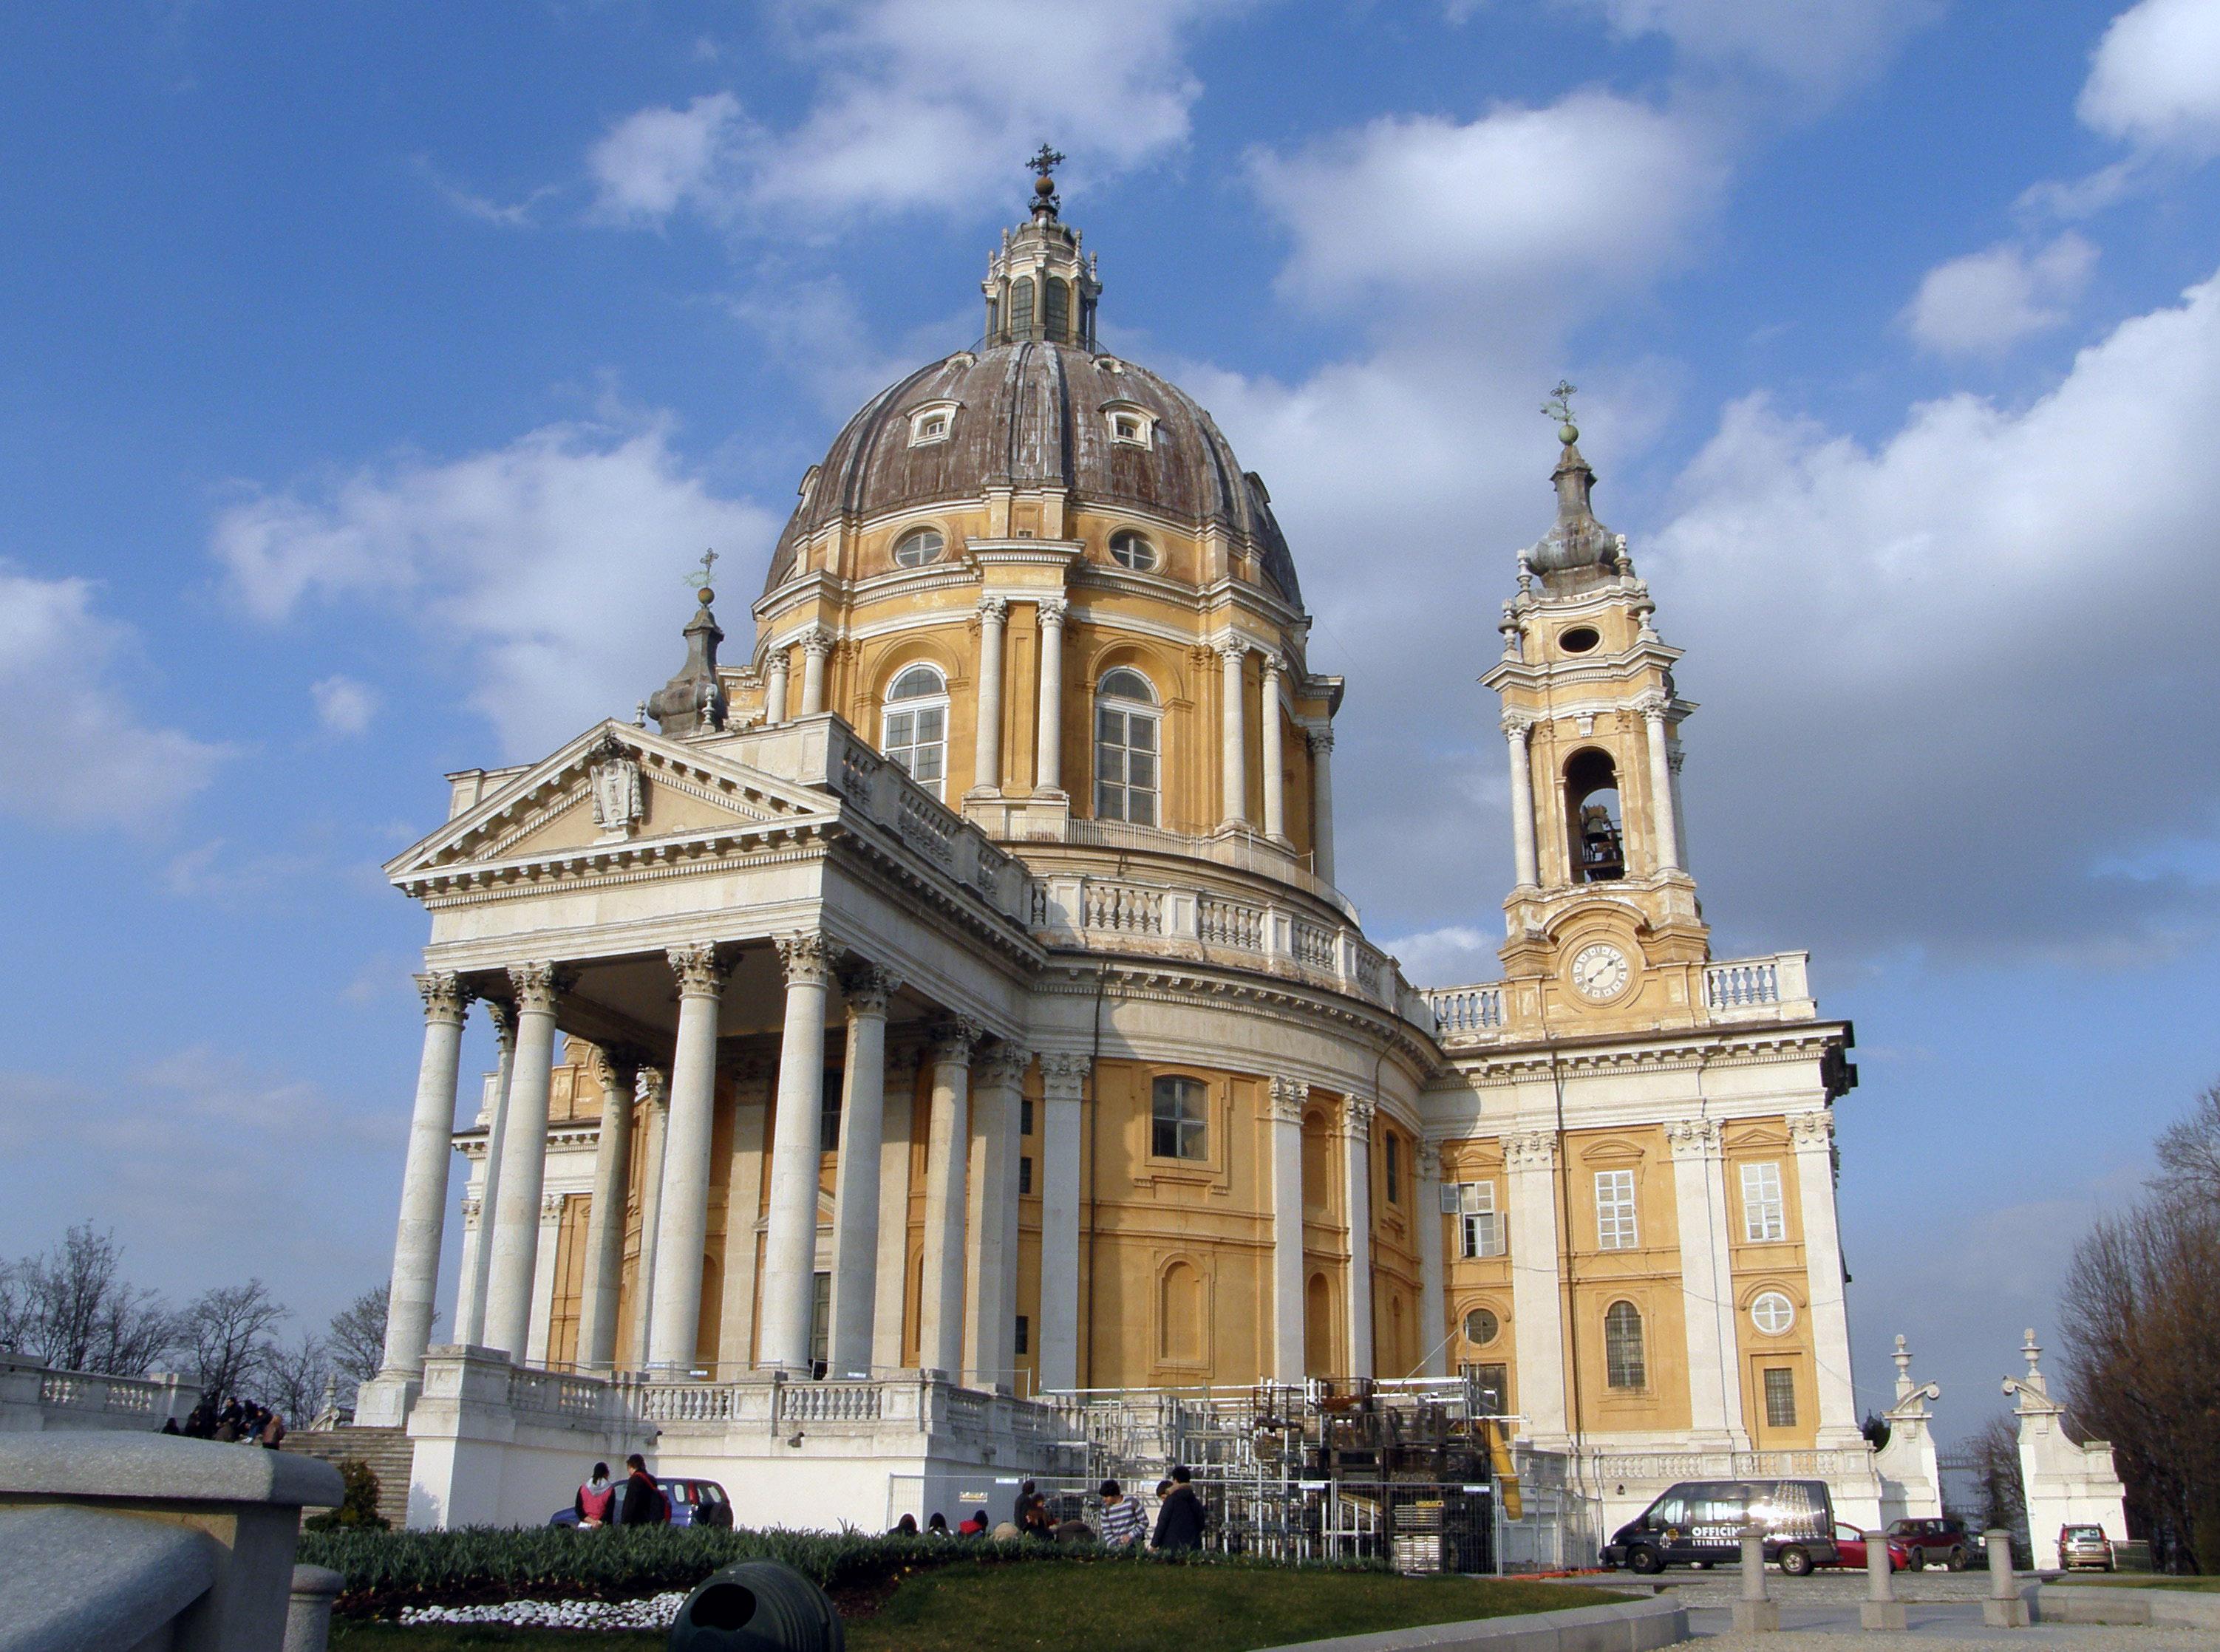 24 Wallpaper Hd File Basilica Di Superga Torino Jpg Wikimedia Commons